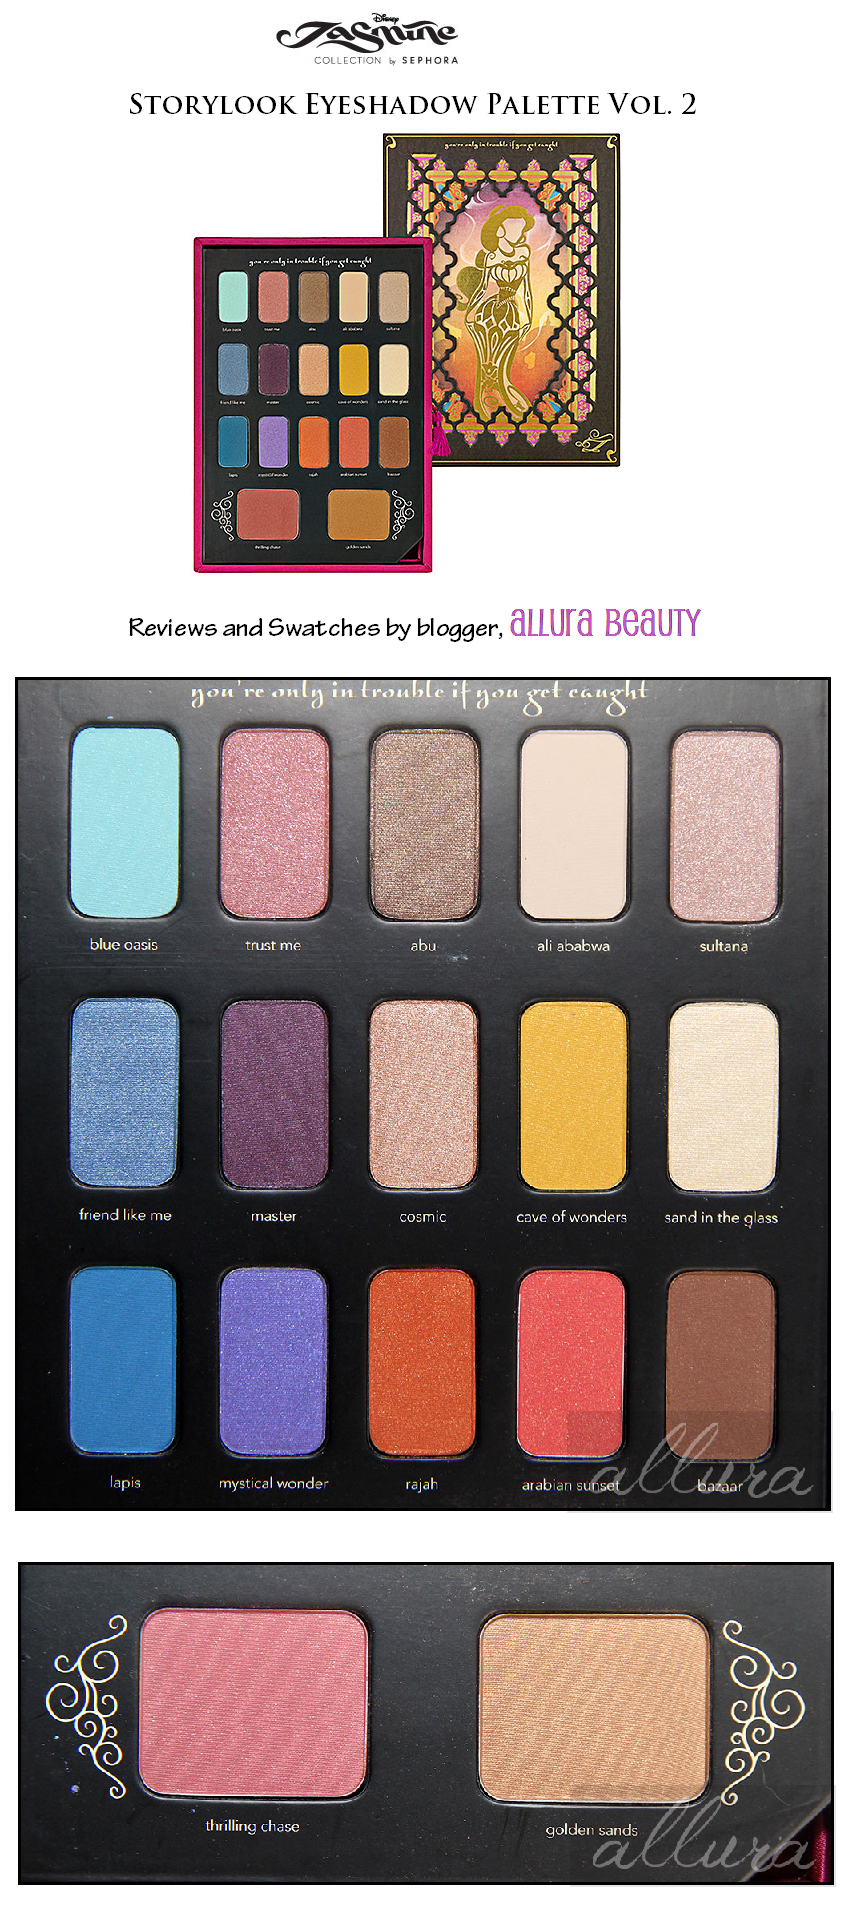 disney jasmine by sephora storylook eyeshadow palette vol 2